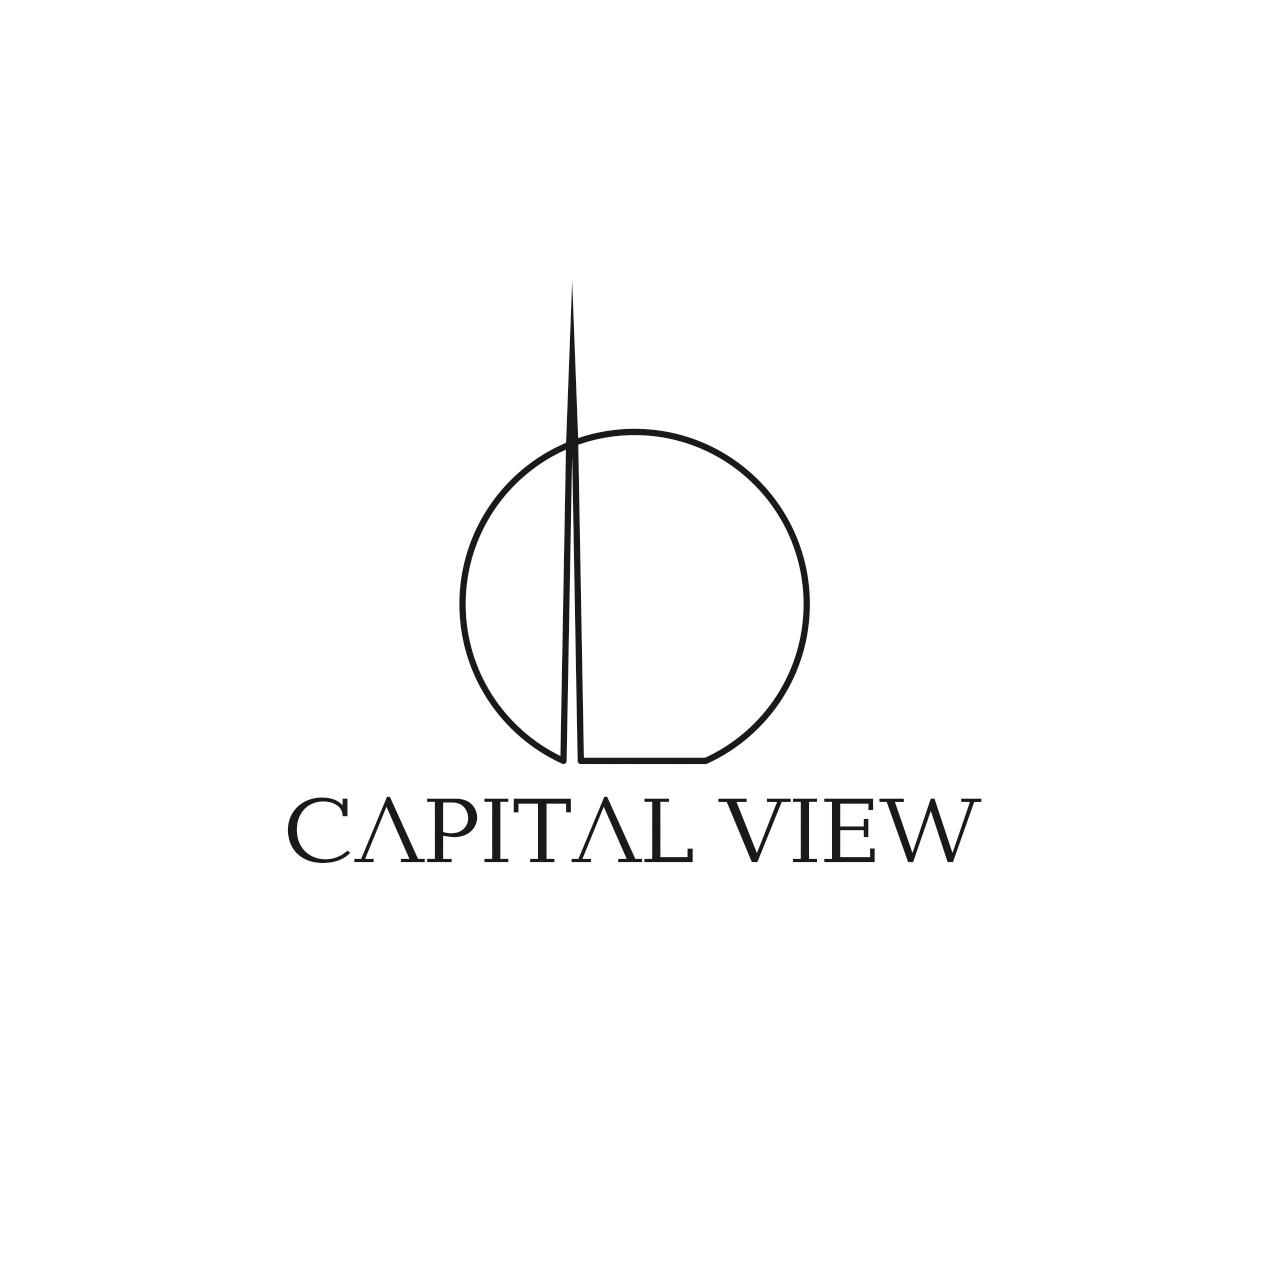 CAPITAL VIEW фото f_4fd9e731170cc.jpg